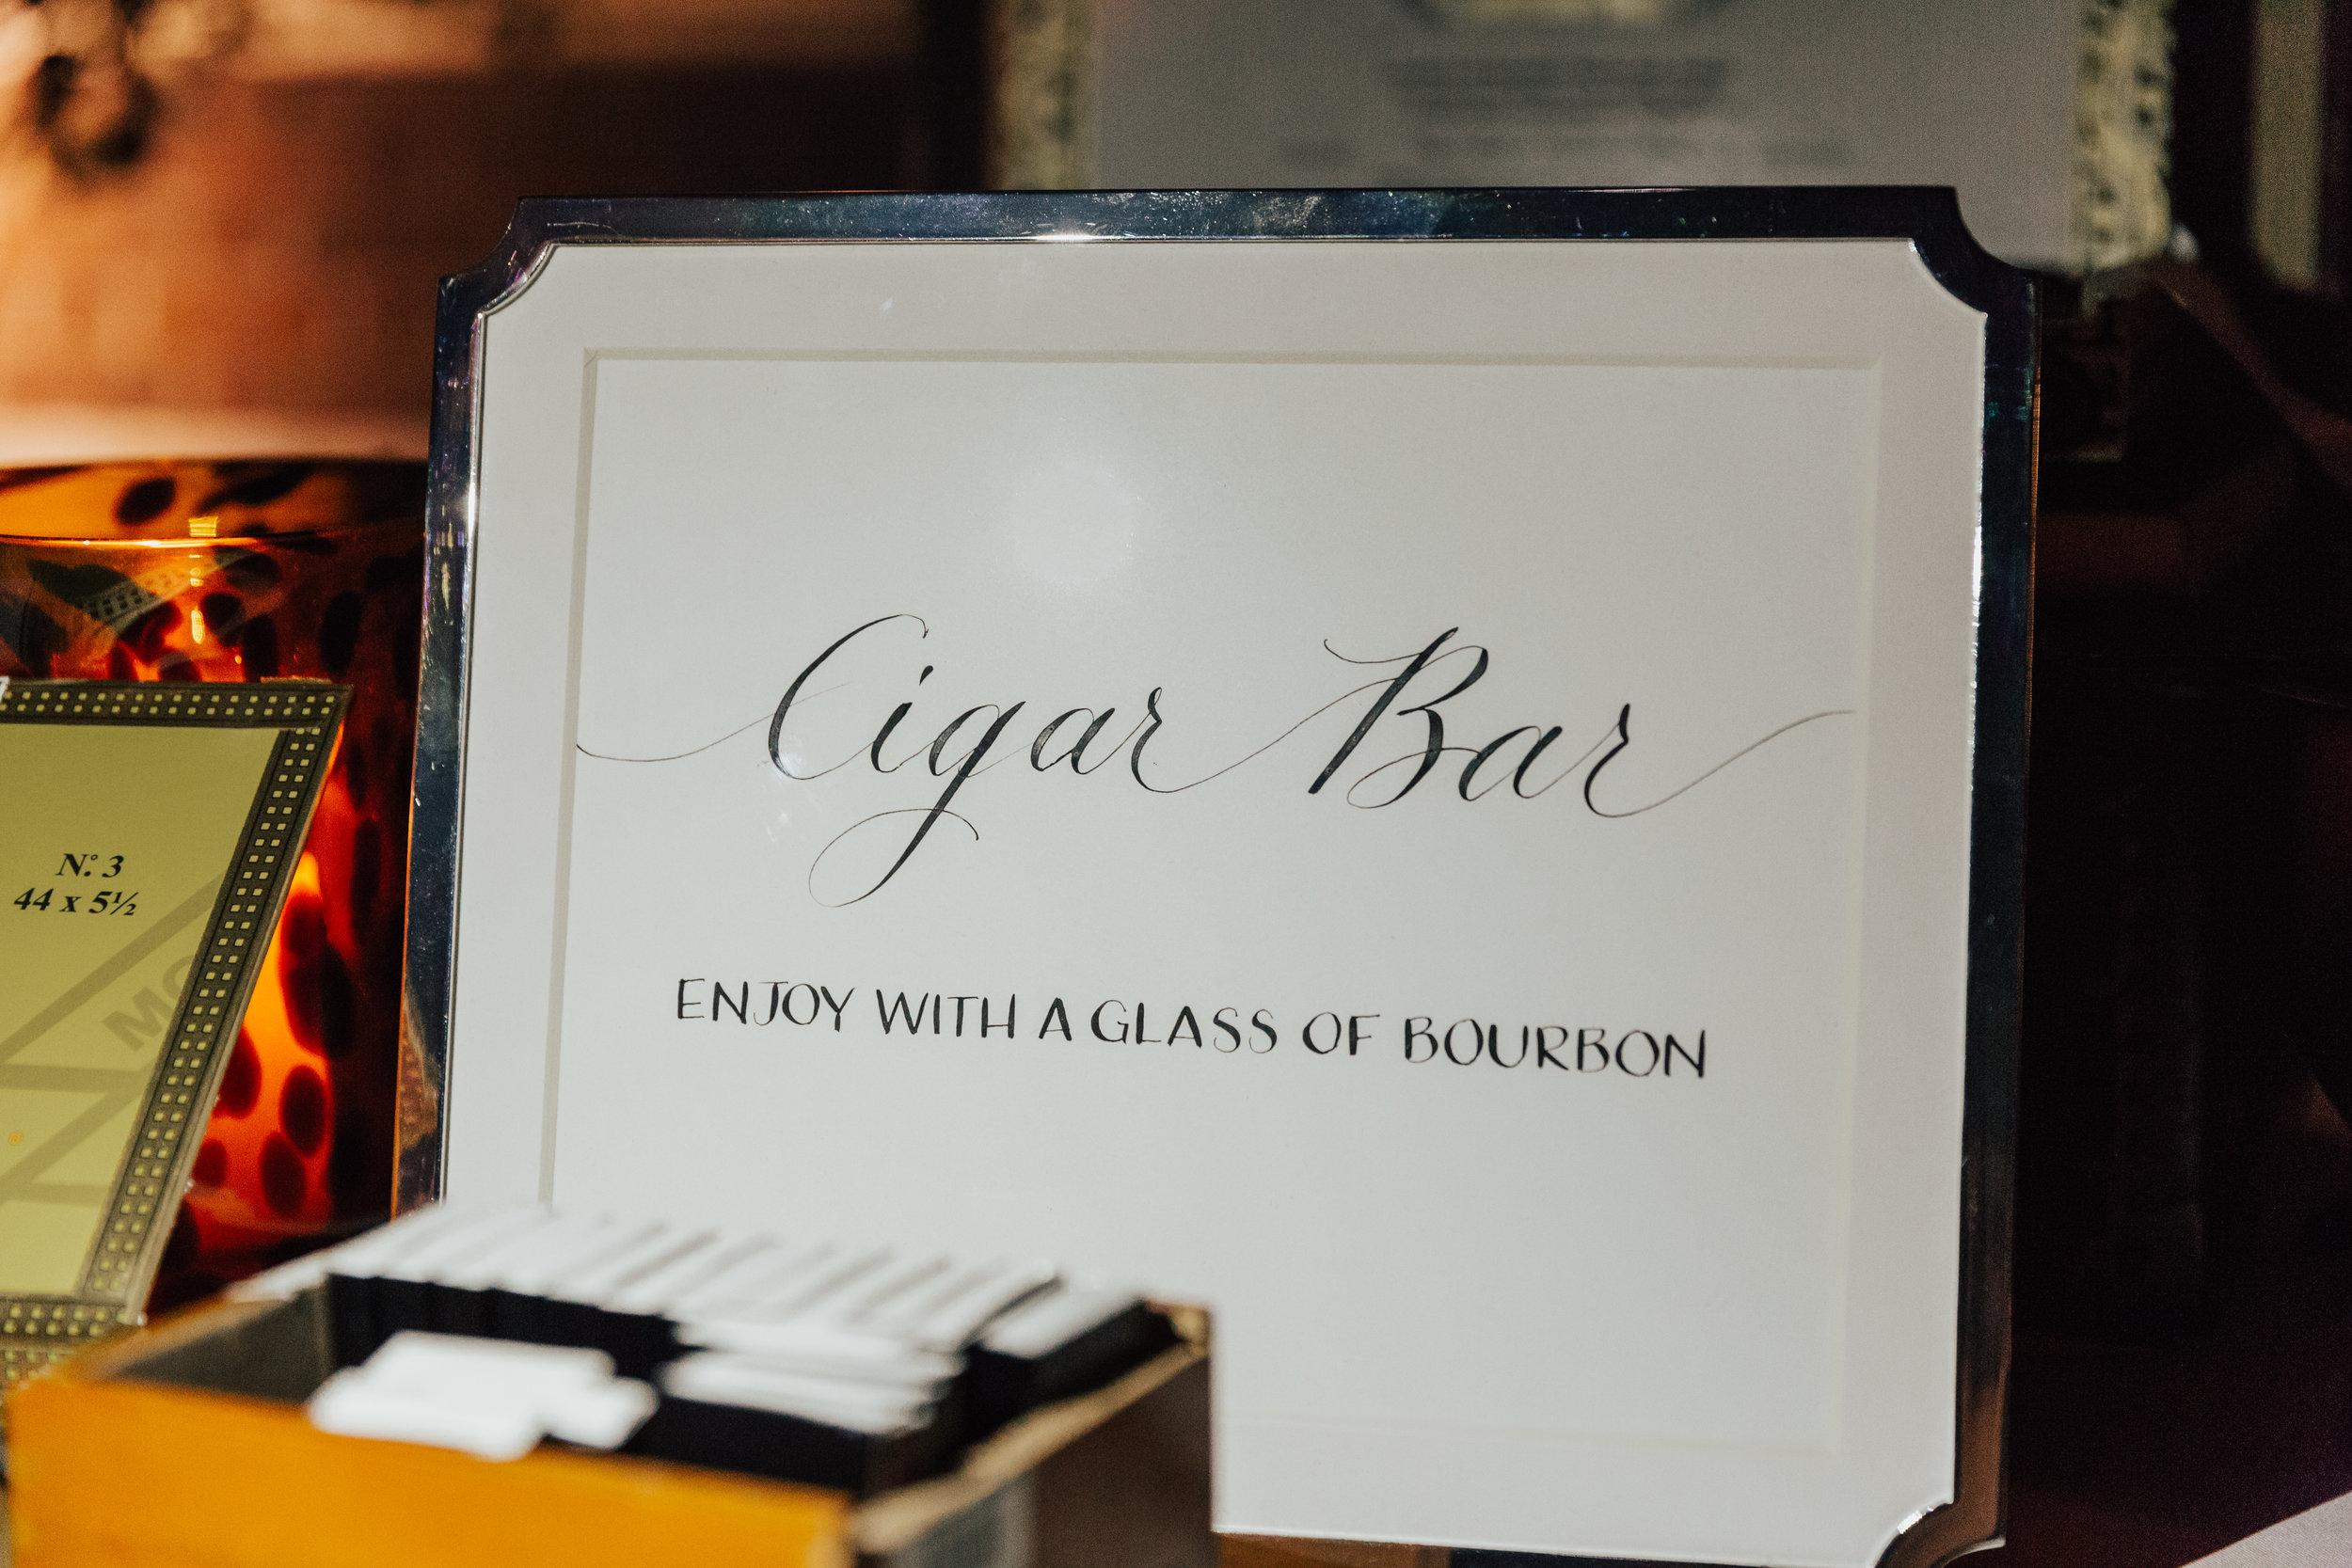 marfuggi cigar bar sign 2.JPG